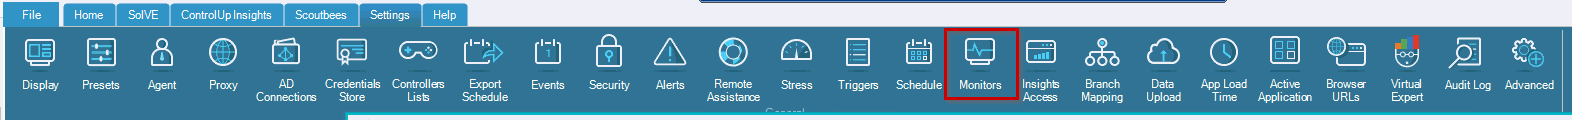 Upgrade Monitors